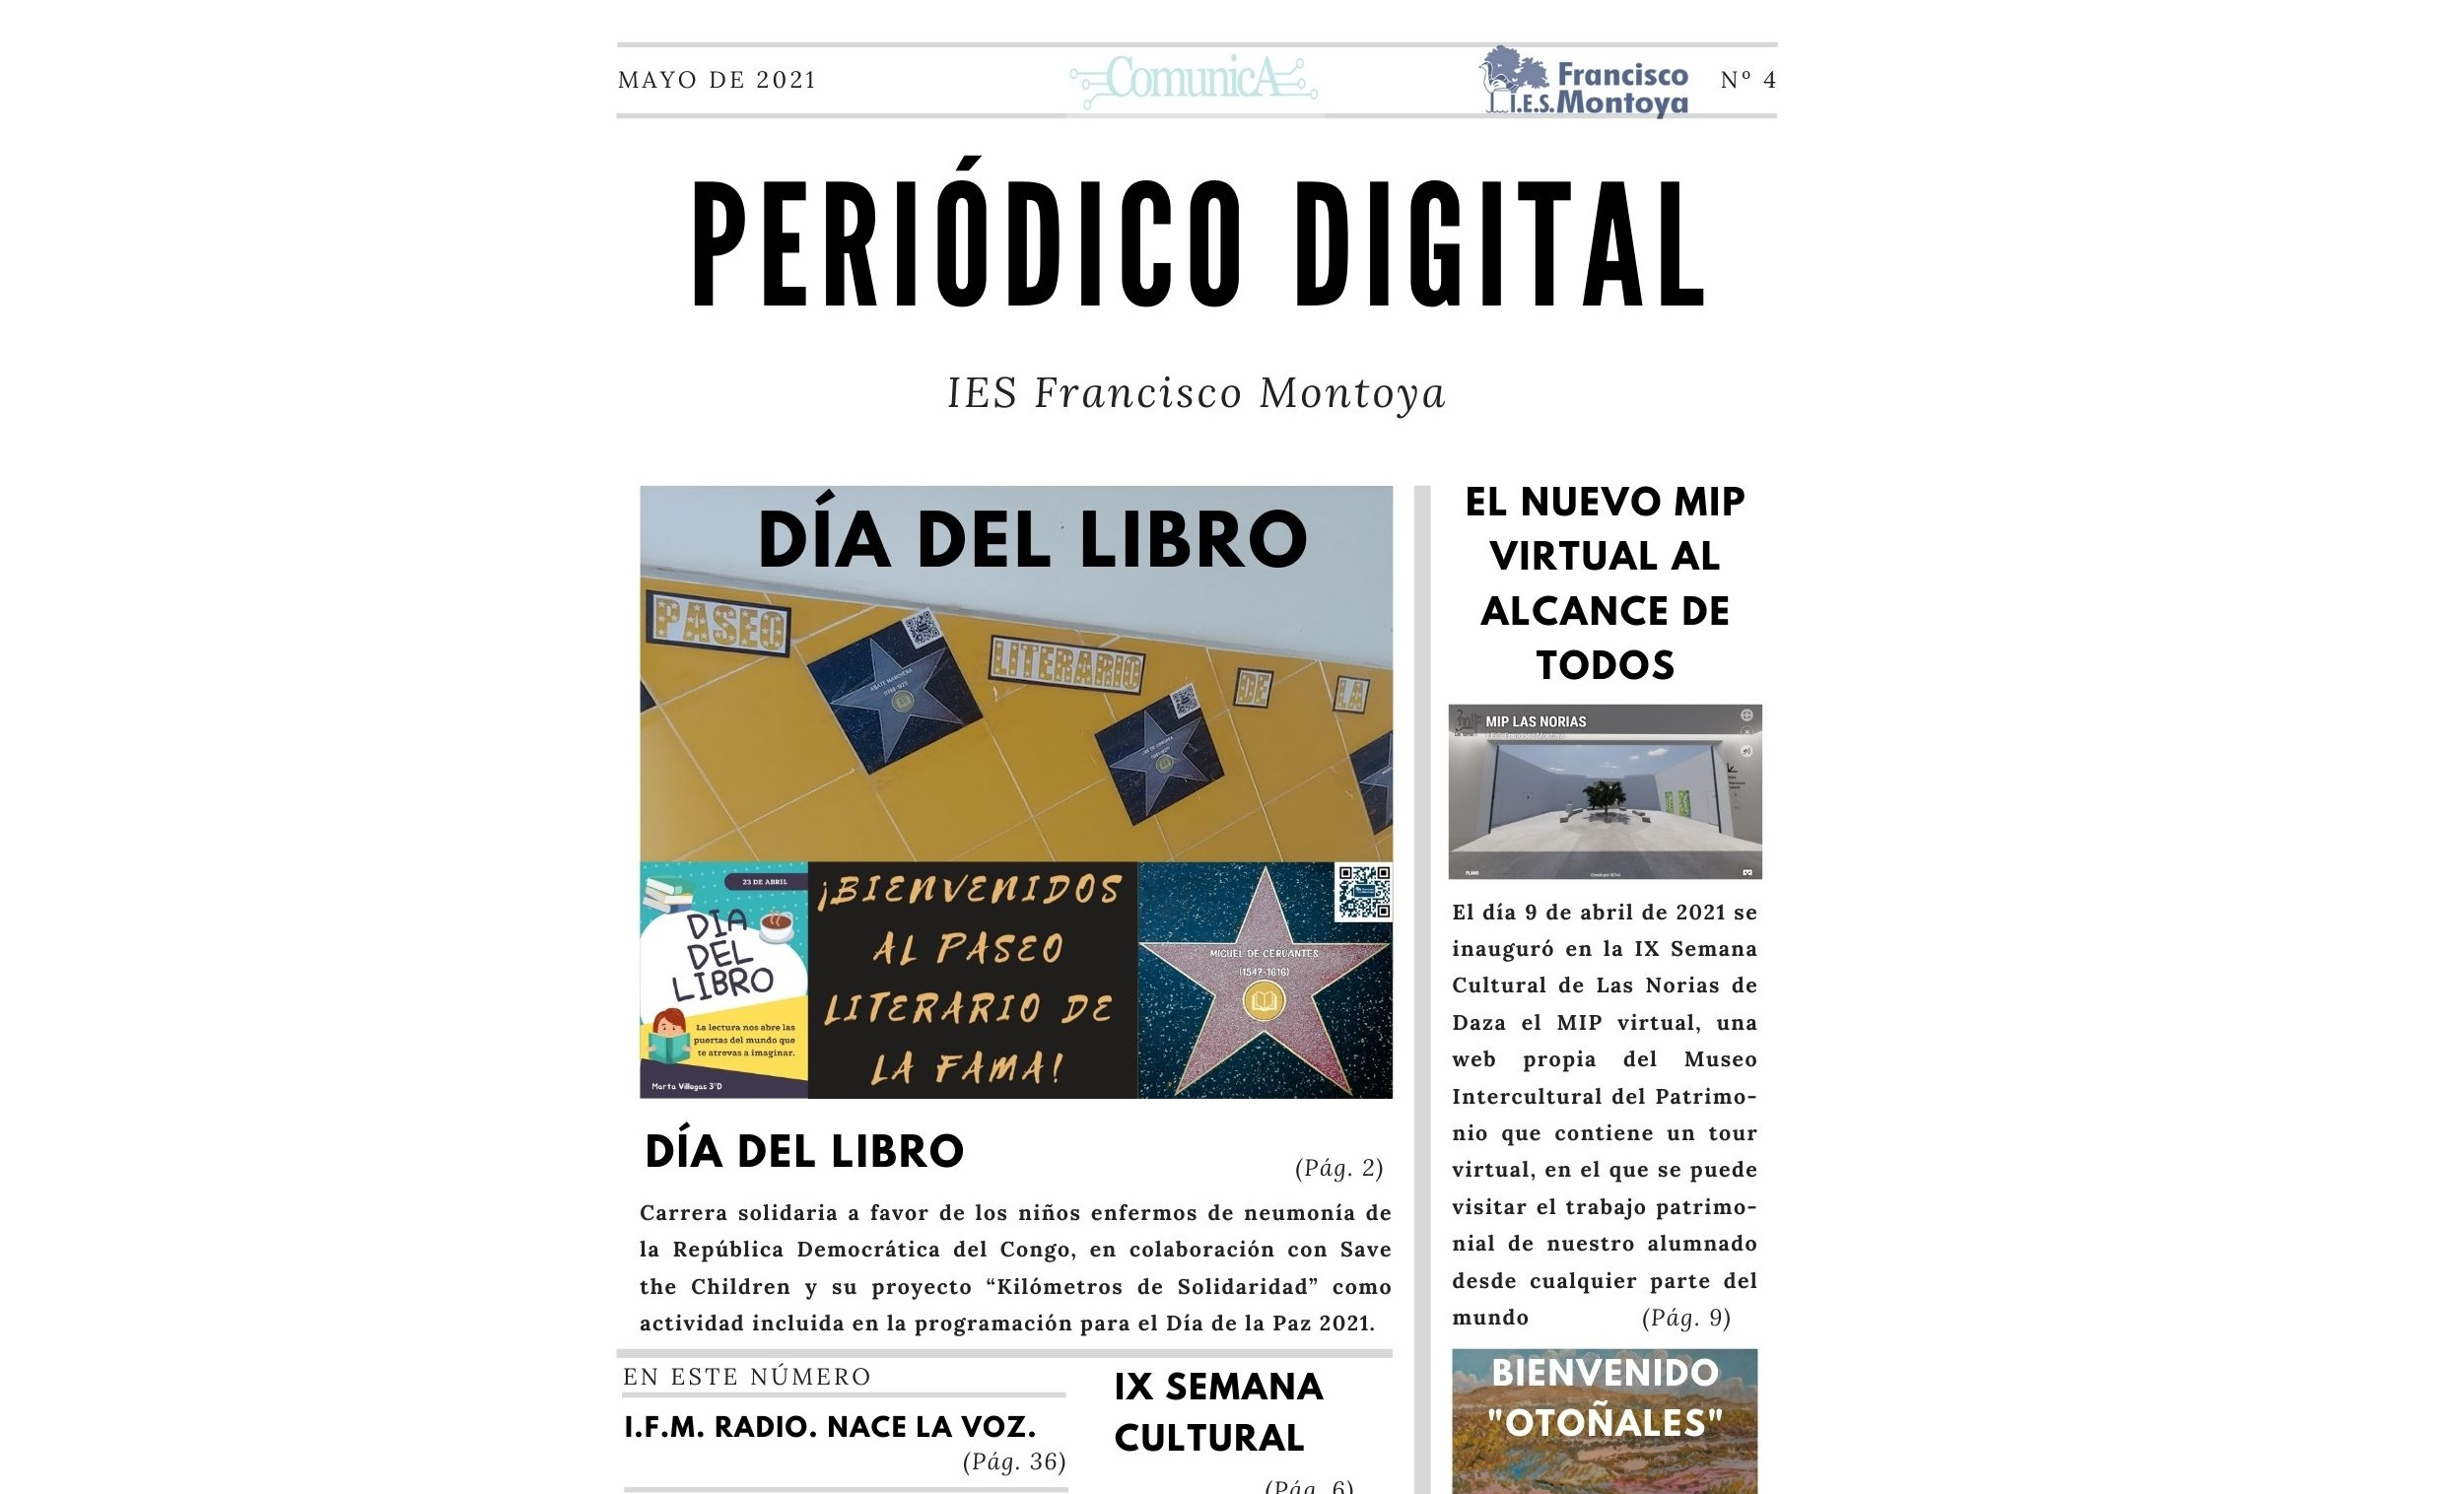 PERIÓDICO DIGITAL IES FRANCISCO MONTOYA Nº4